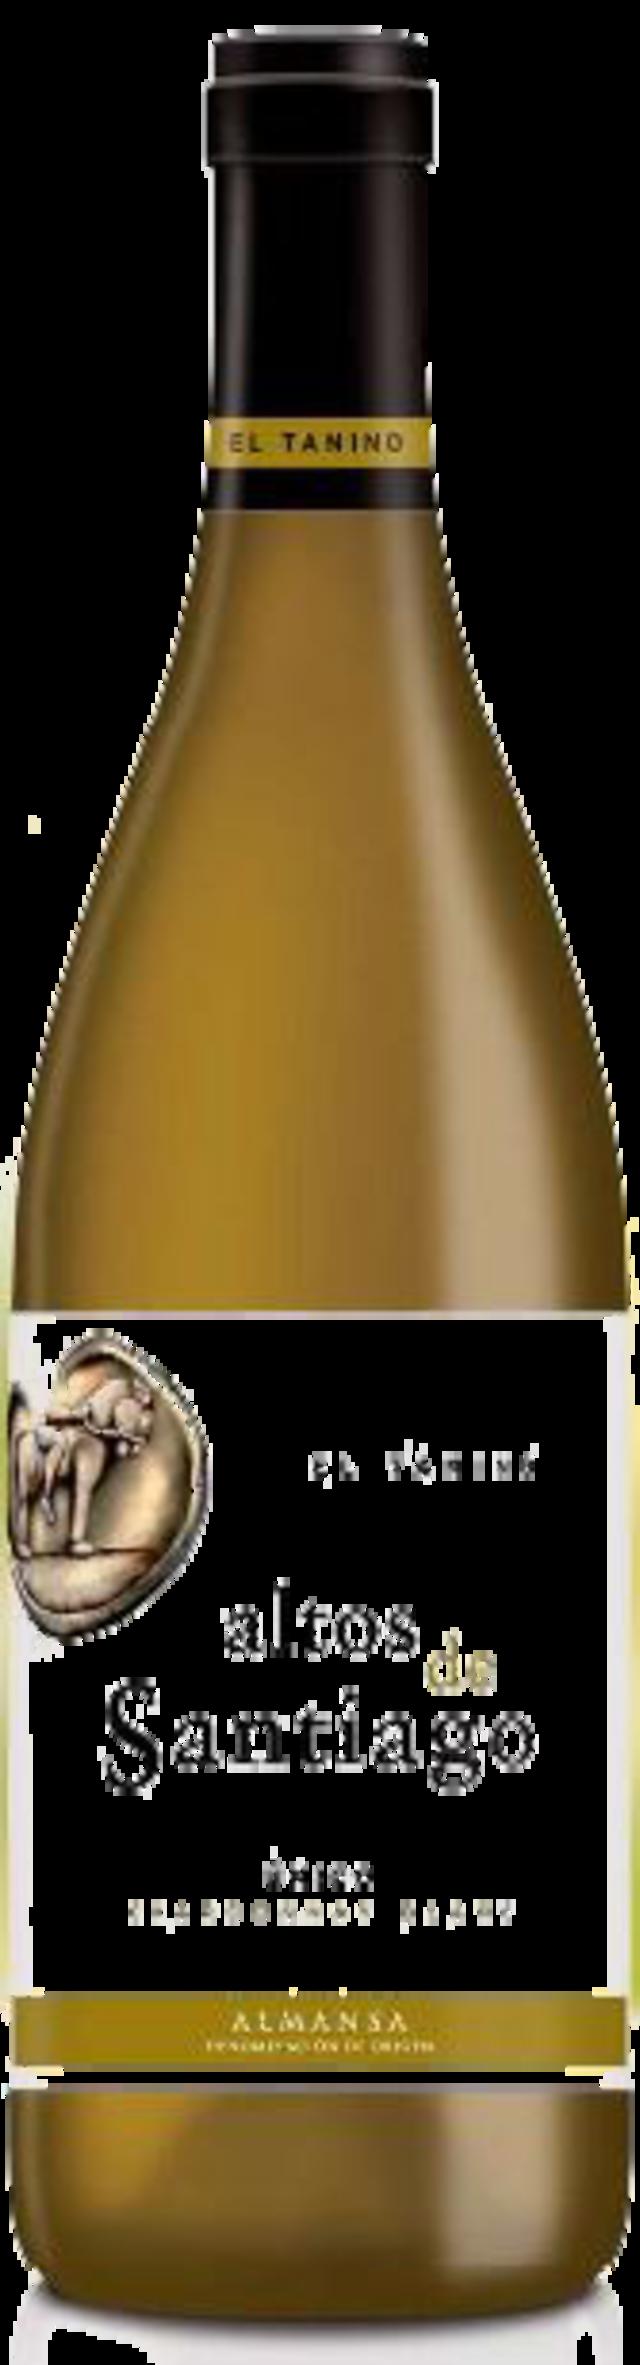 Altos de Santiago Chardonnay